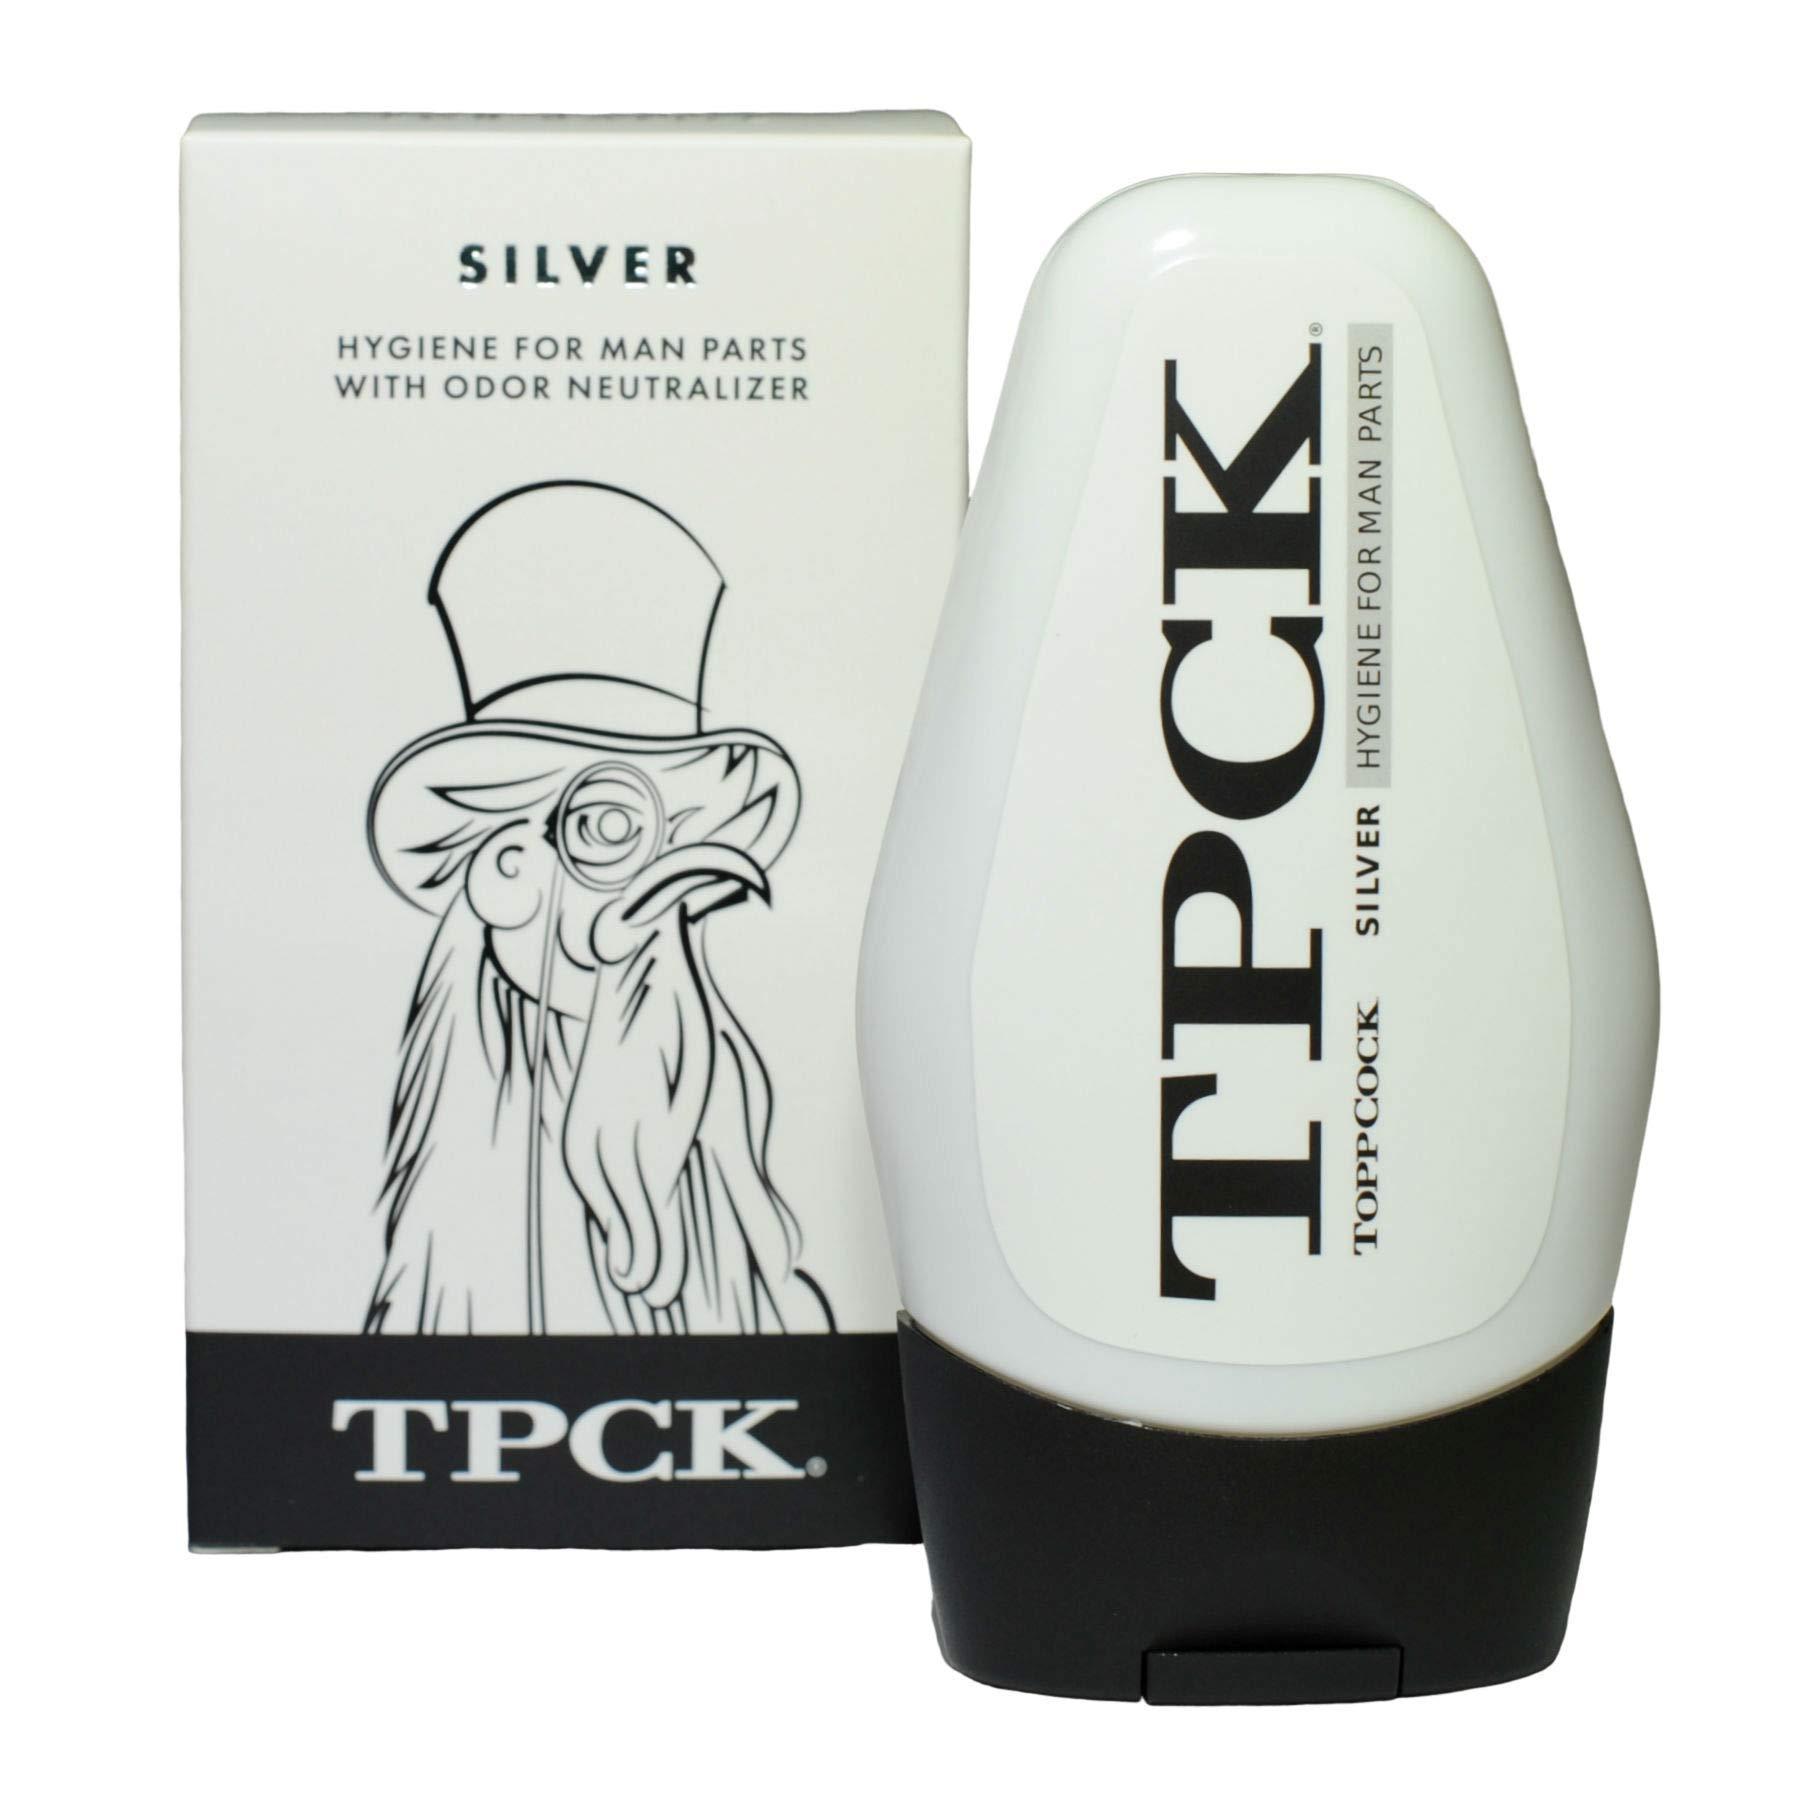 TPCK ToppCock Silver Leave-On Hygiene Gel for Man Parts, 90ml Odor Neutralizer, Male Care Moisturizing Body Hygiene